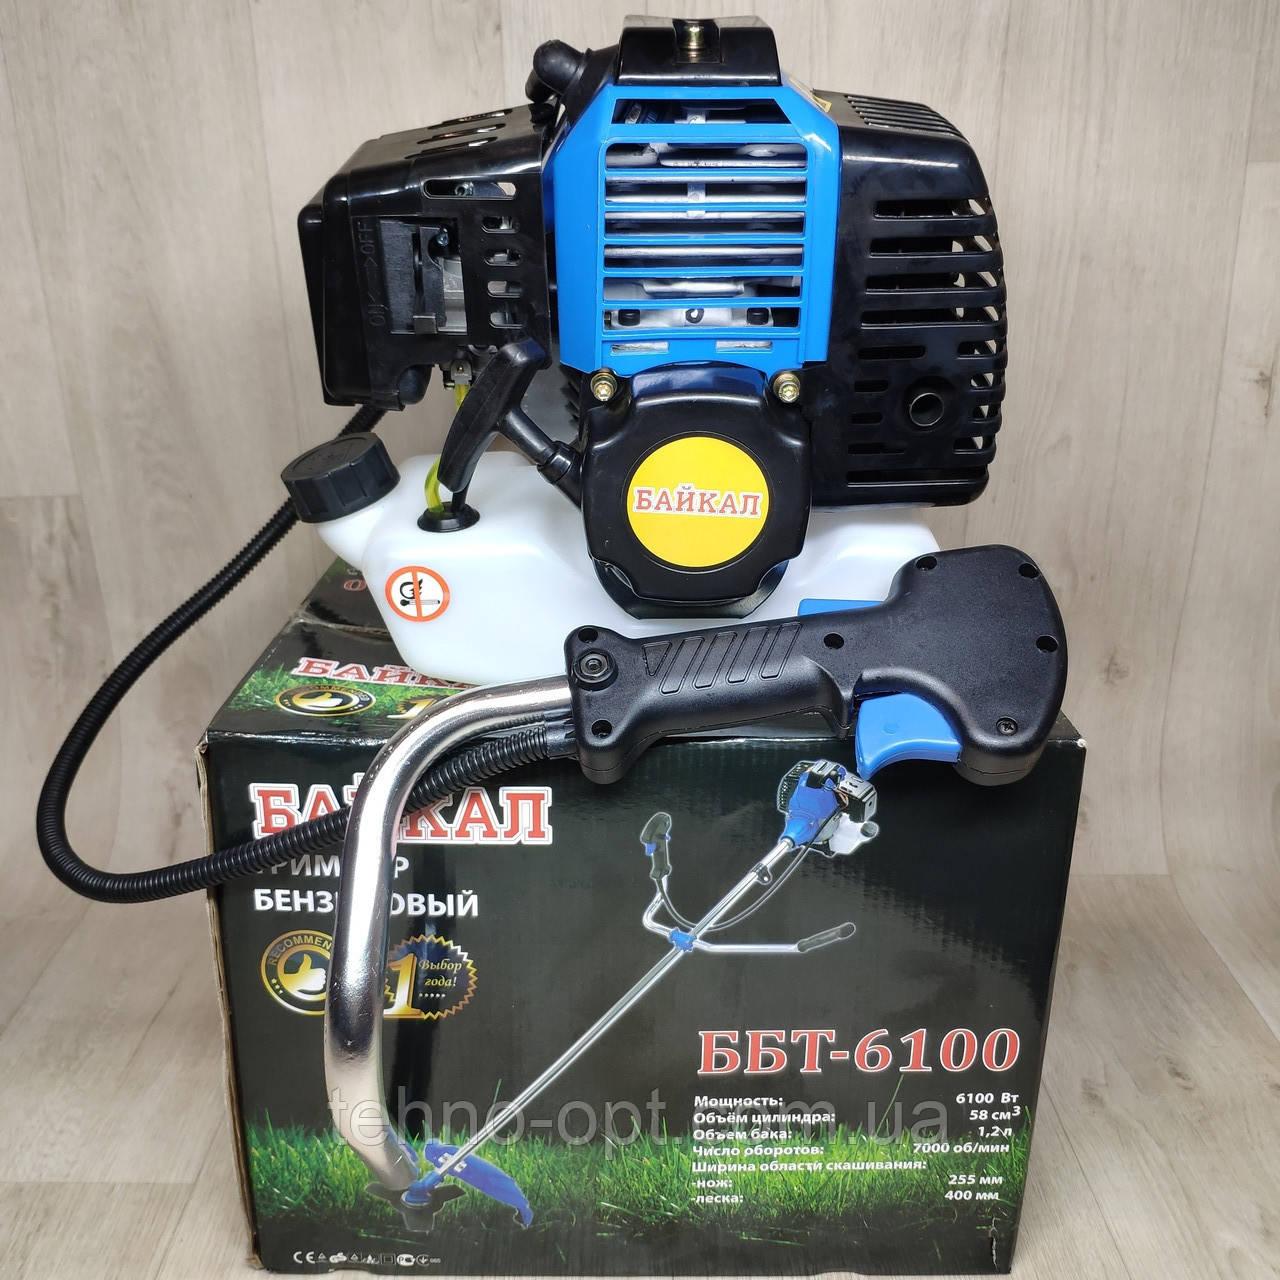 Бензокоса Байкал ББТ-6100 Professional